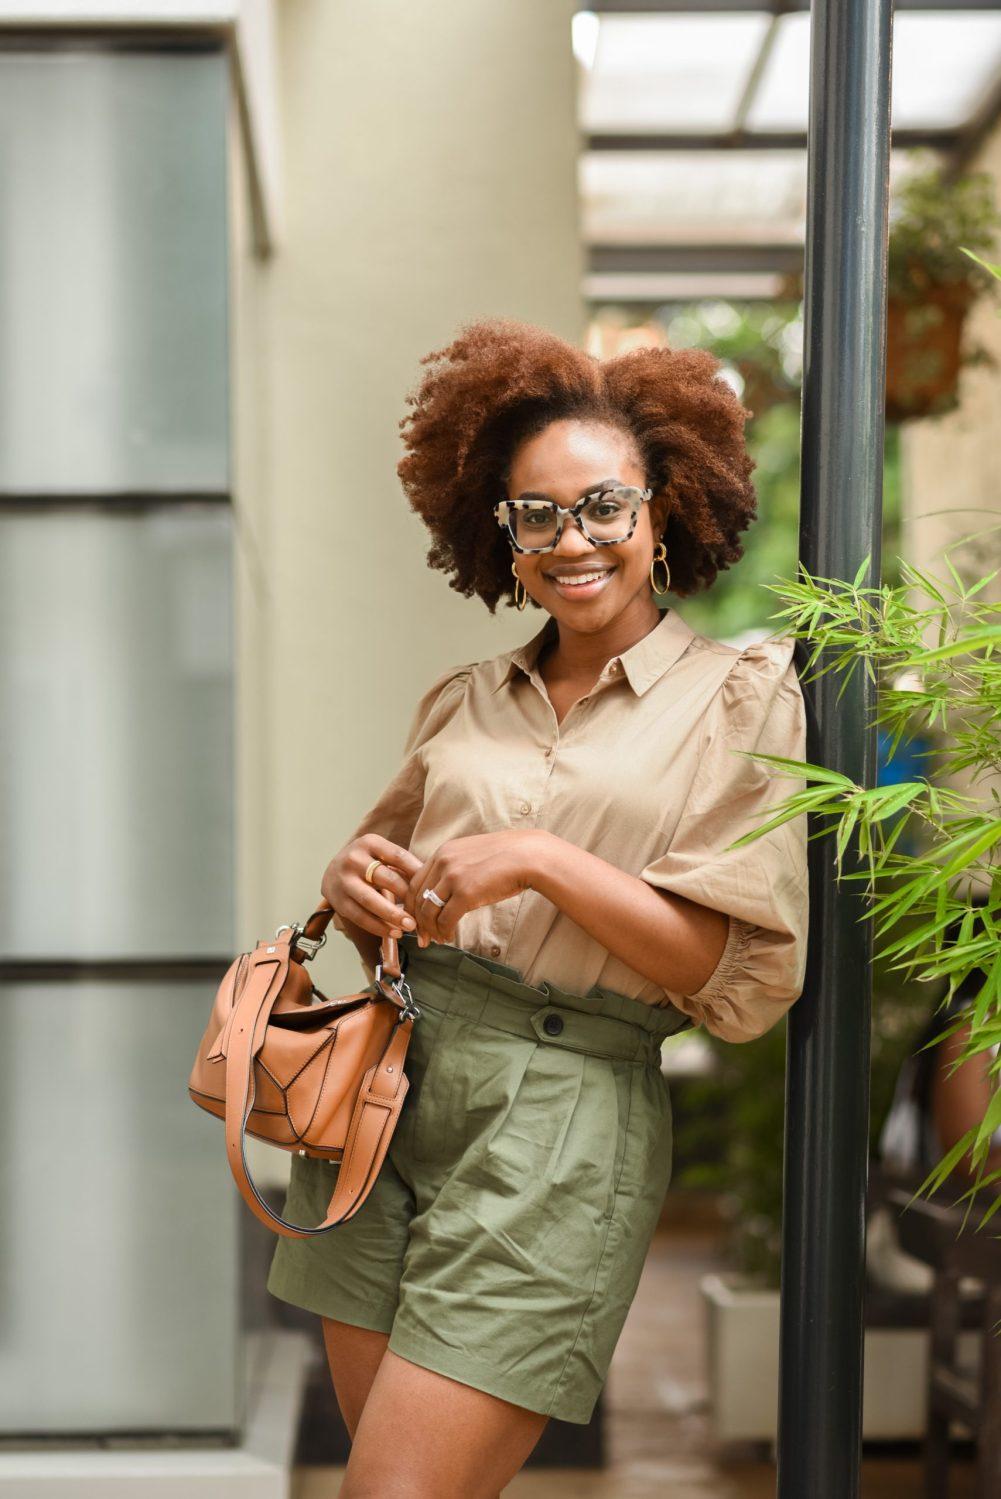 Ijeoma Kola posing in beige shirt and khaki shorts with brown handbag